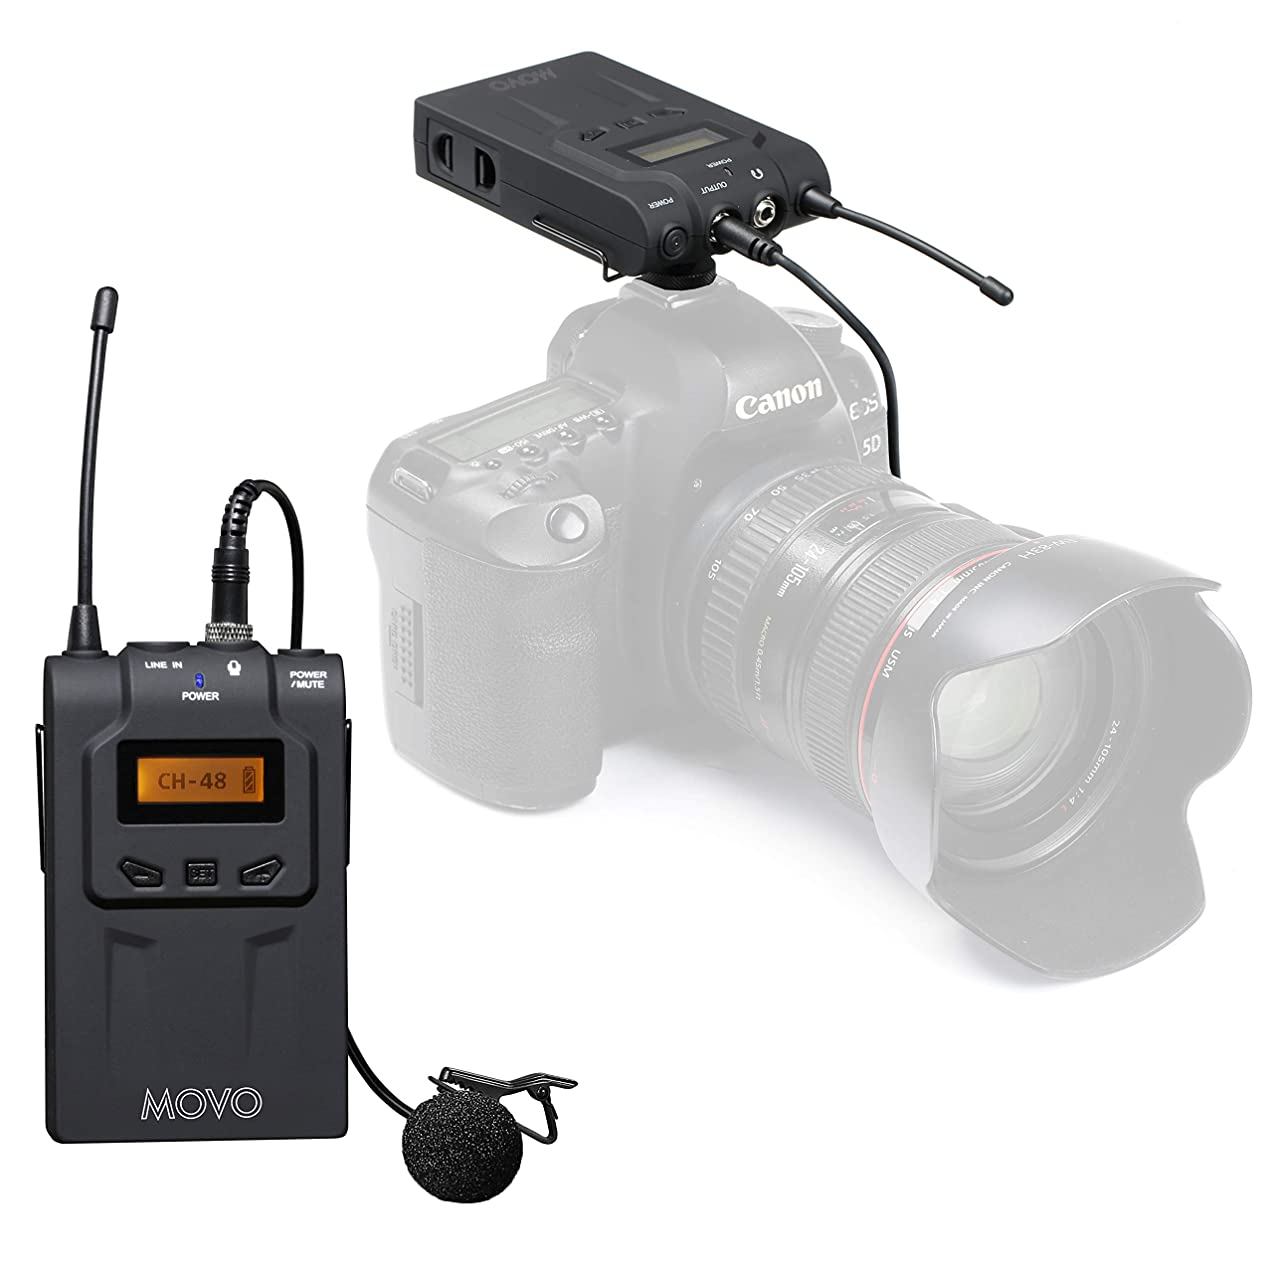 Movo Wireless UHF Lavalier Microphone System for Nikon D850, D810, D800, D750, D610, D600, D500, D7500, D7200, D7100, D5600, D5500, D5300, D5200, D3400, D3300, D3200, D4, D5 DSLR Cameras